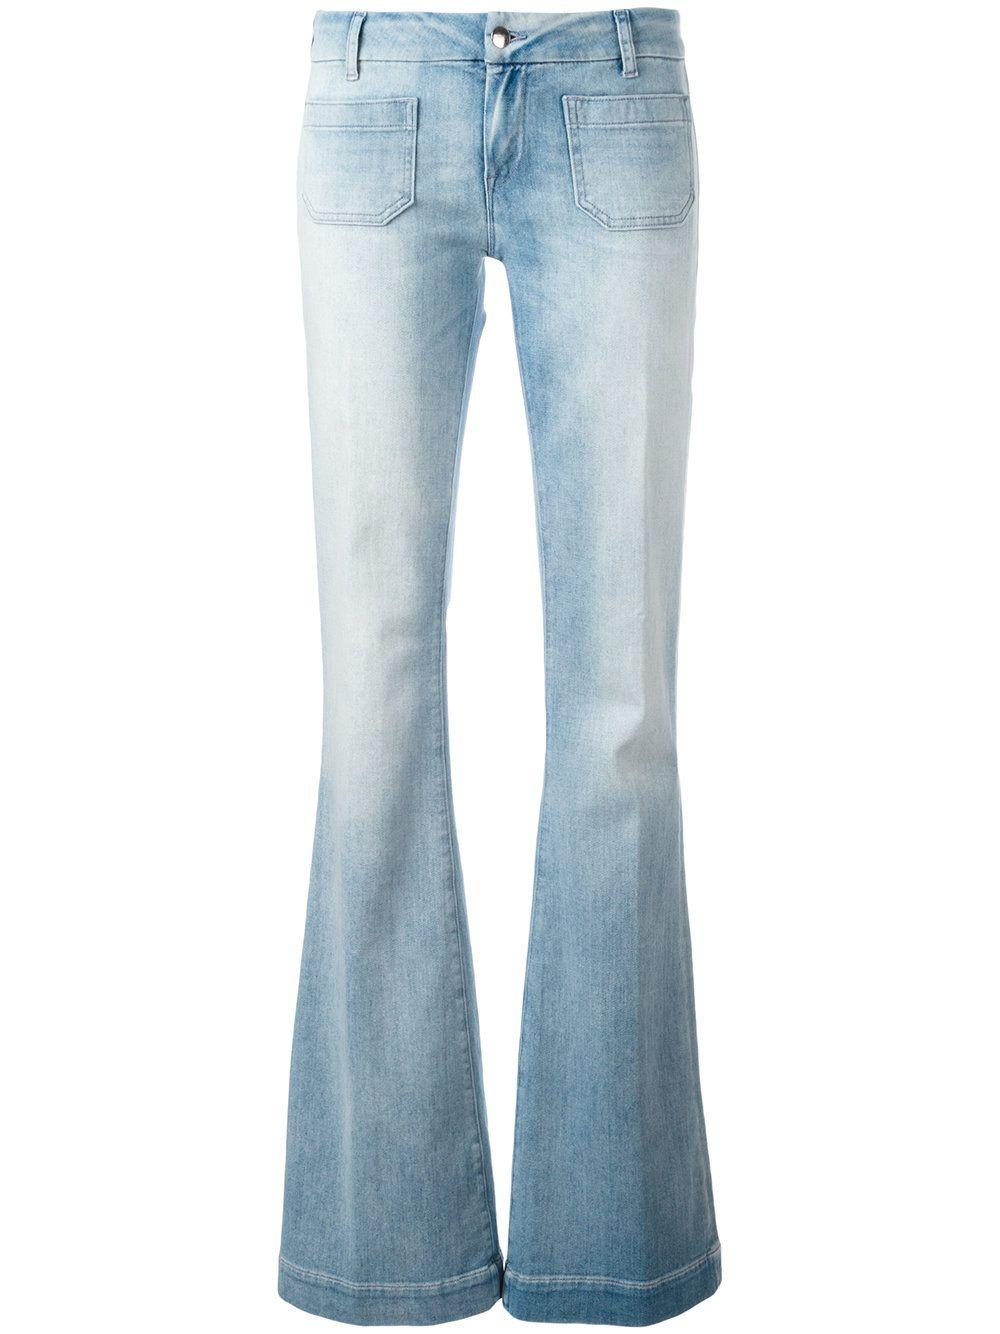 The Seafarer straight-leg jeans